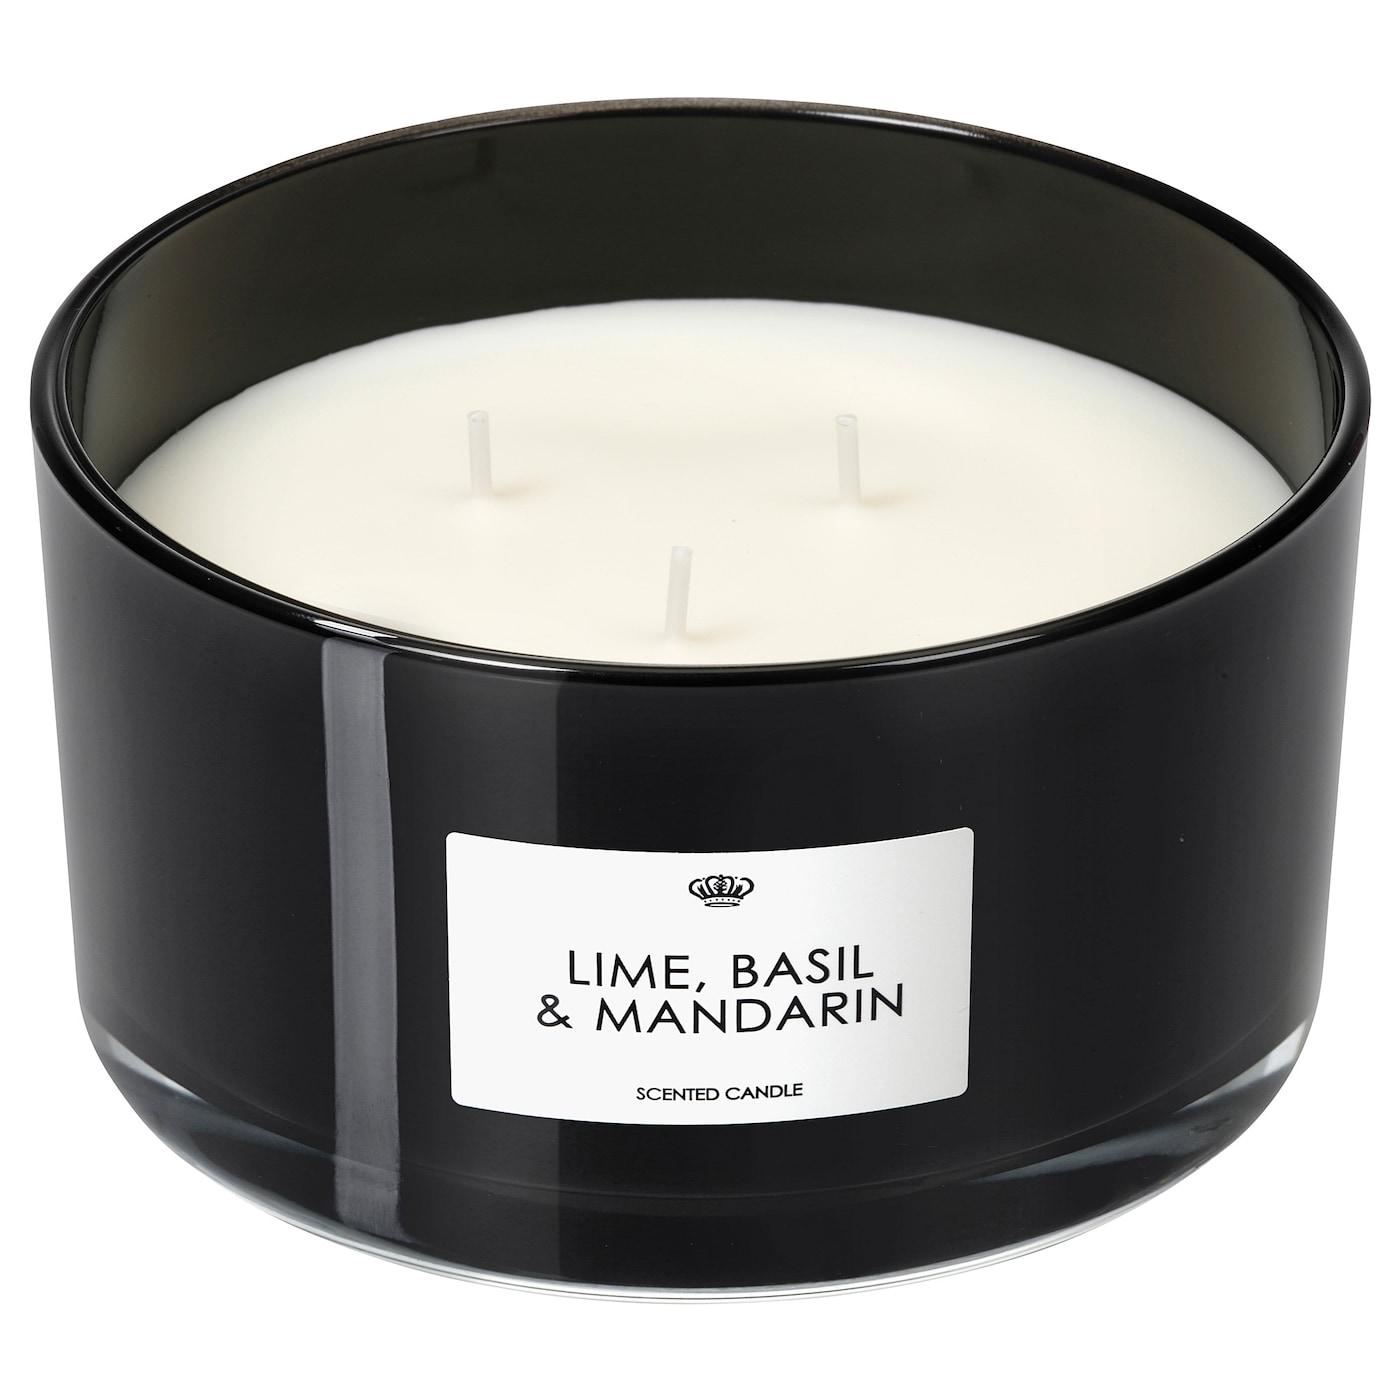 Lime Basil /& Mandarin Handpoured Scented Tea Lights Candles Tealights pack of 6